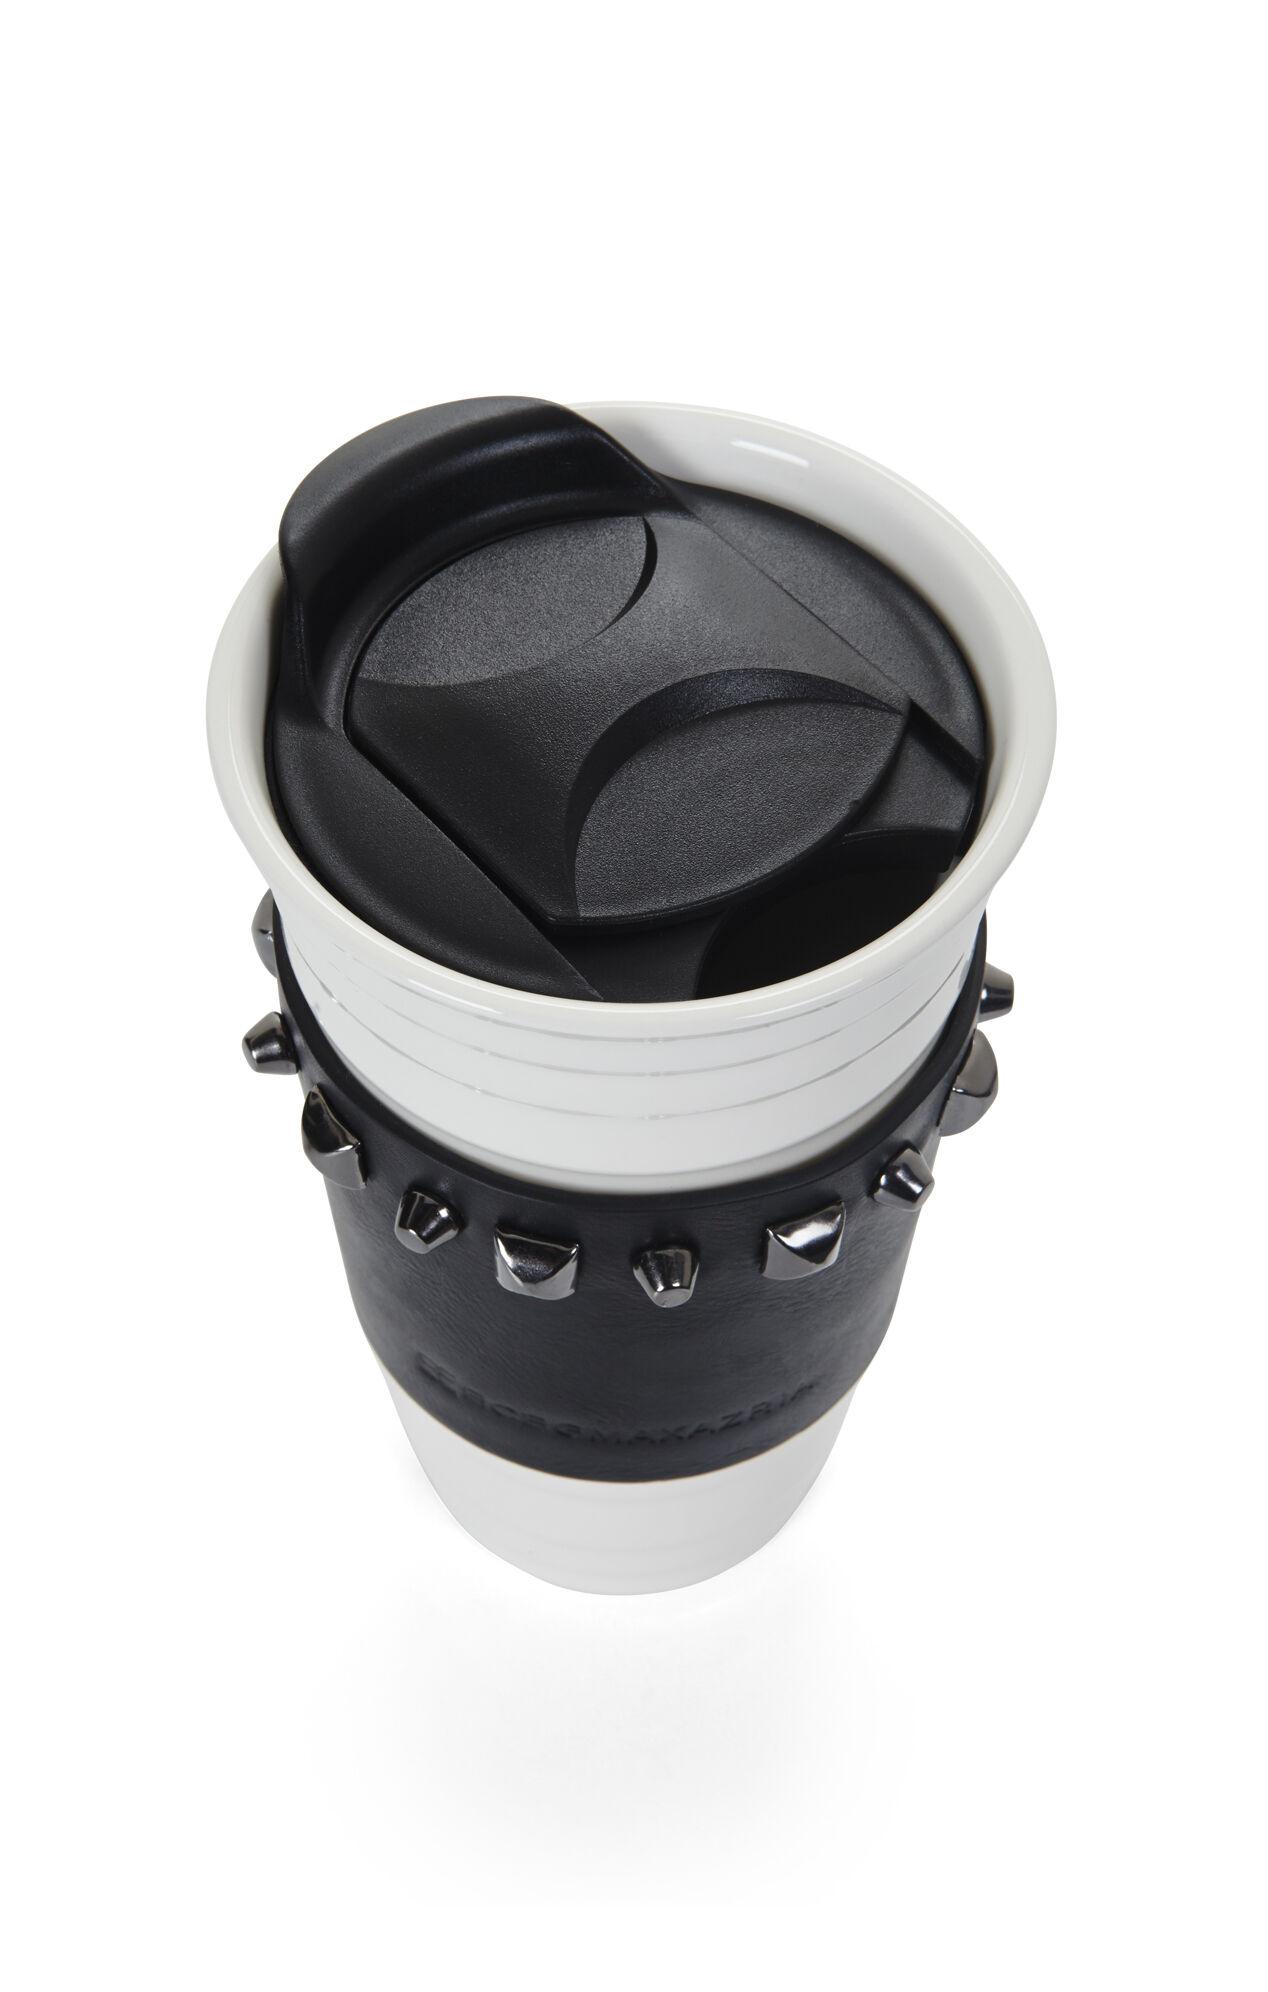 16 OZ Ceramic Mug with Sleeve